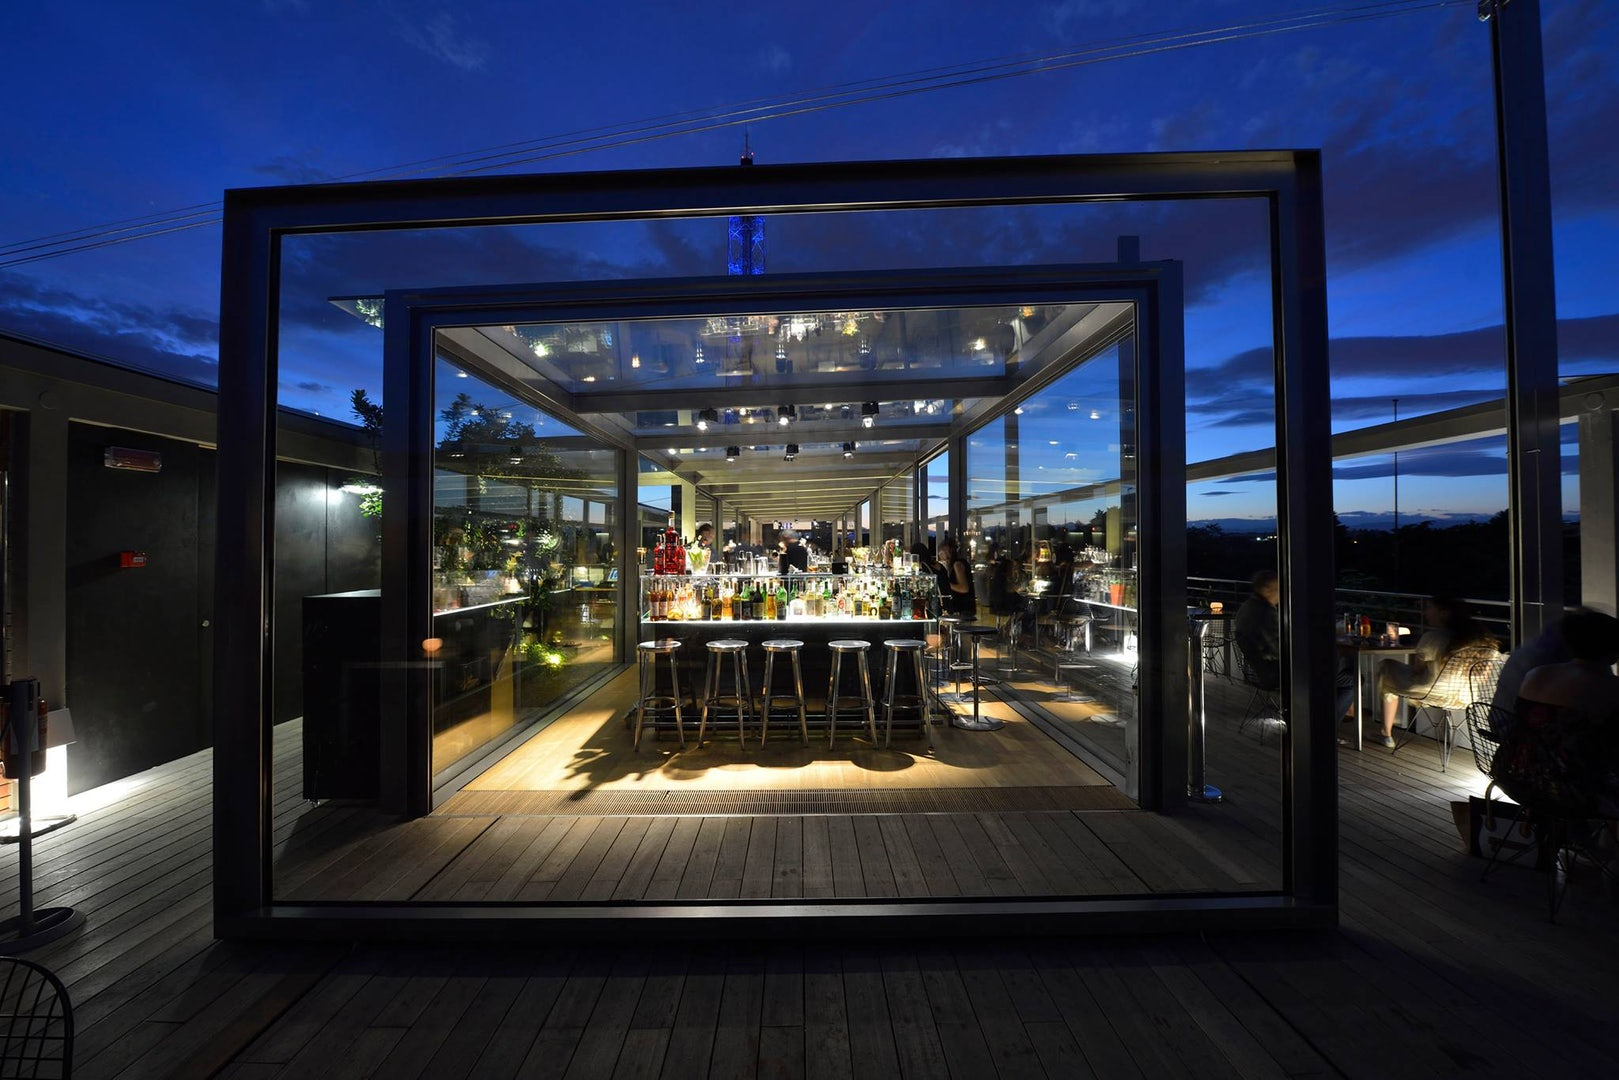 Terrazza Triennale in Vienna against a dark sky